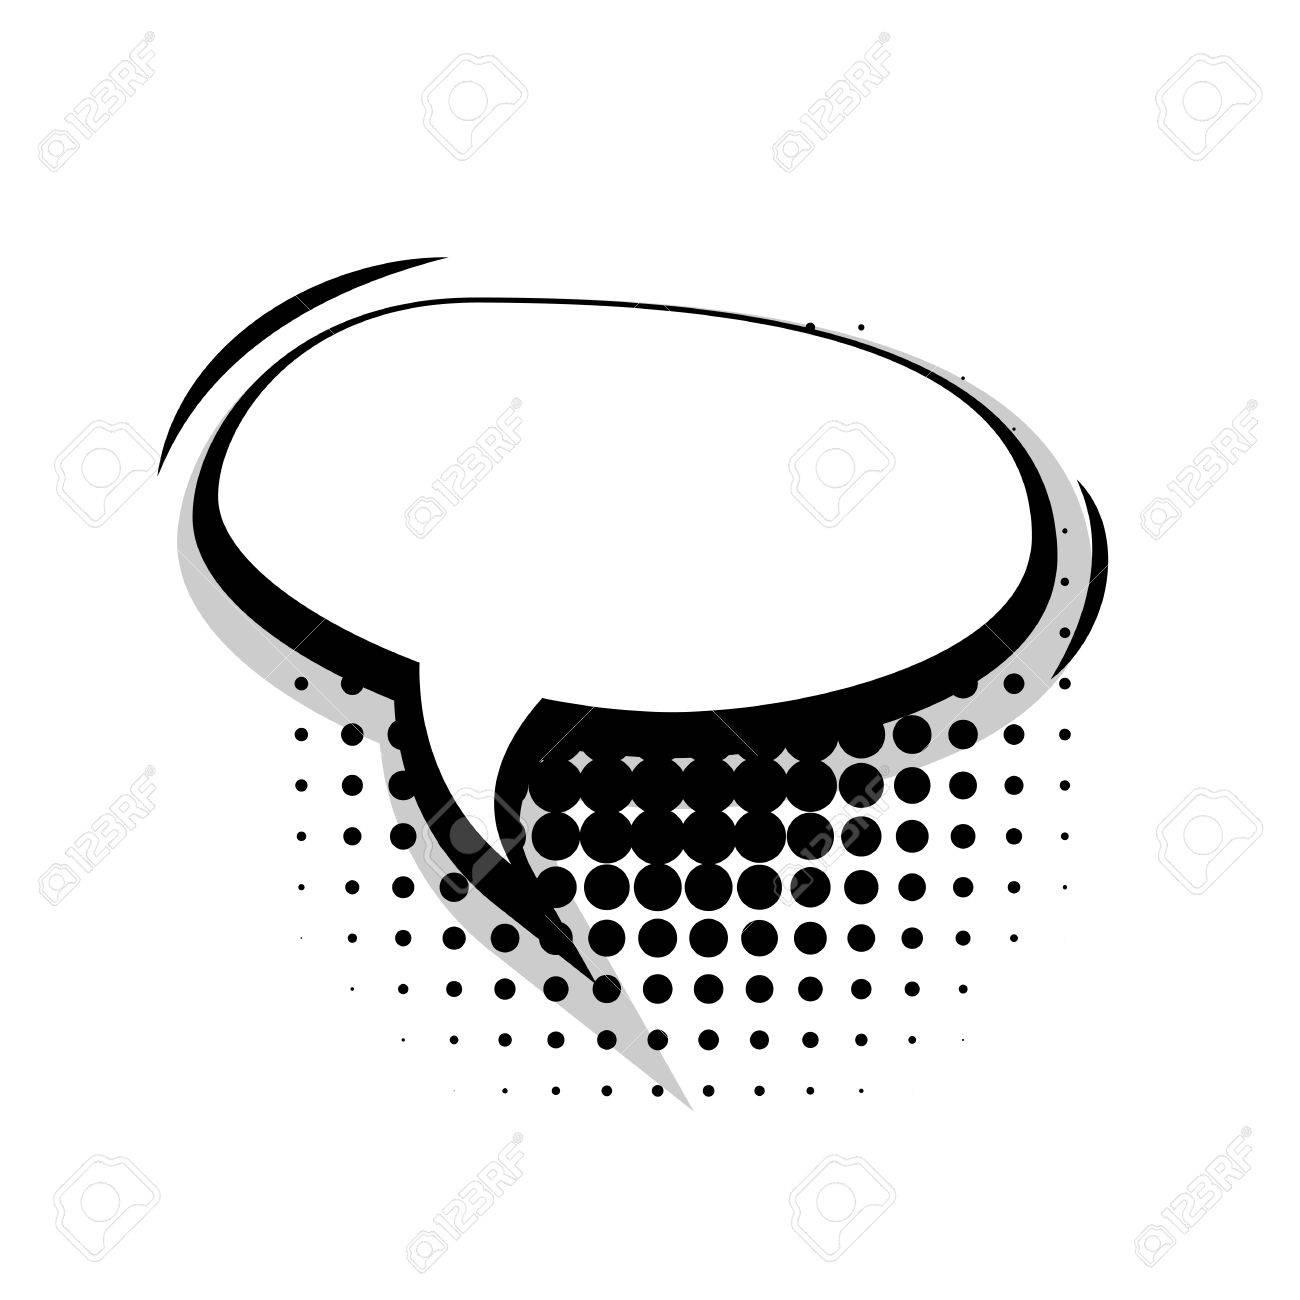 Blank Template Comic Speech Oval Lines Bubble Halftone Dot ...